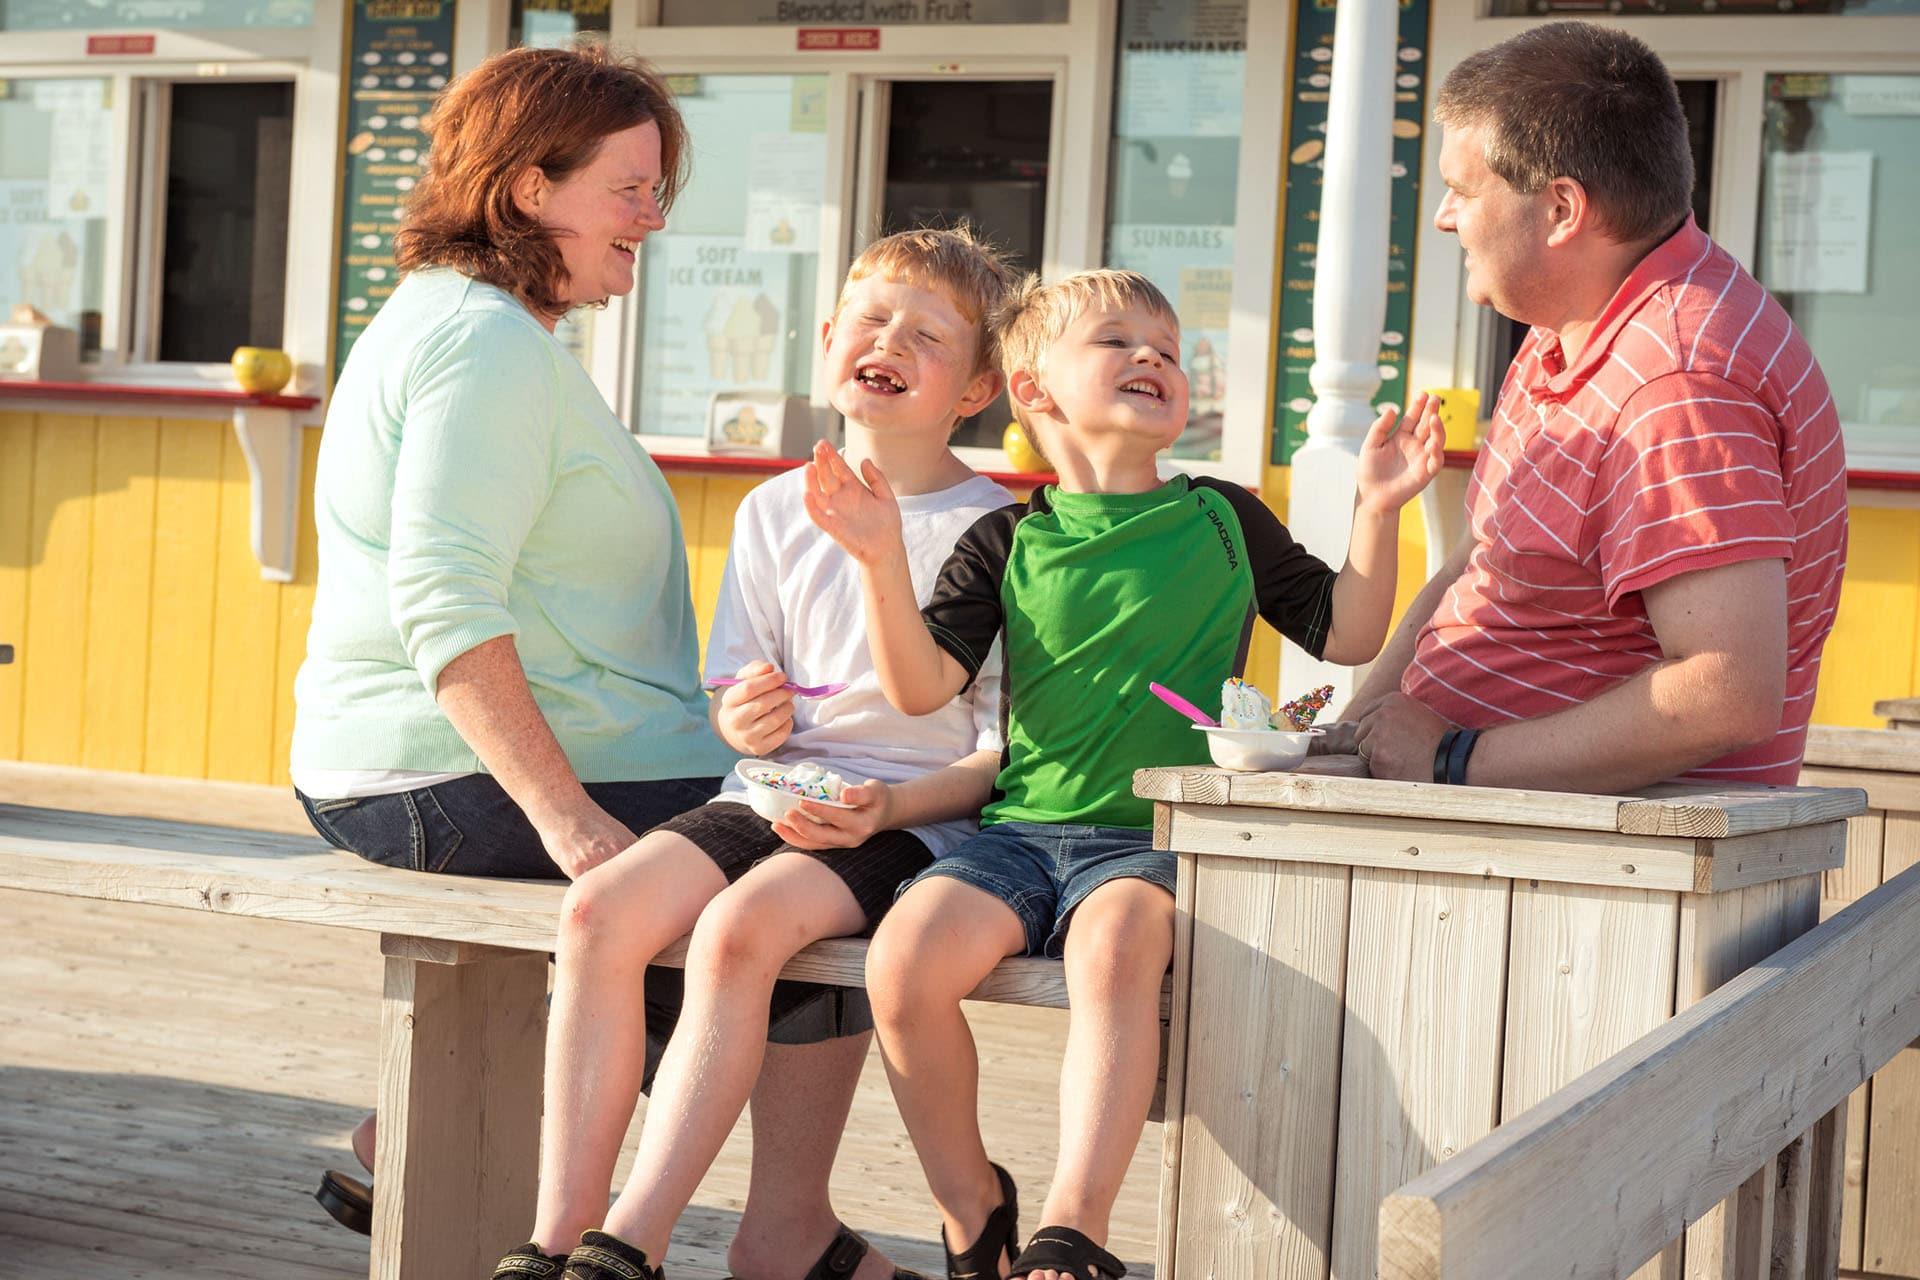 North Cape Coastal Drive, Ice Cream Kids